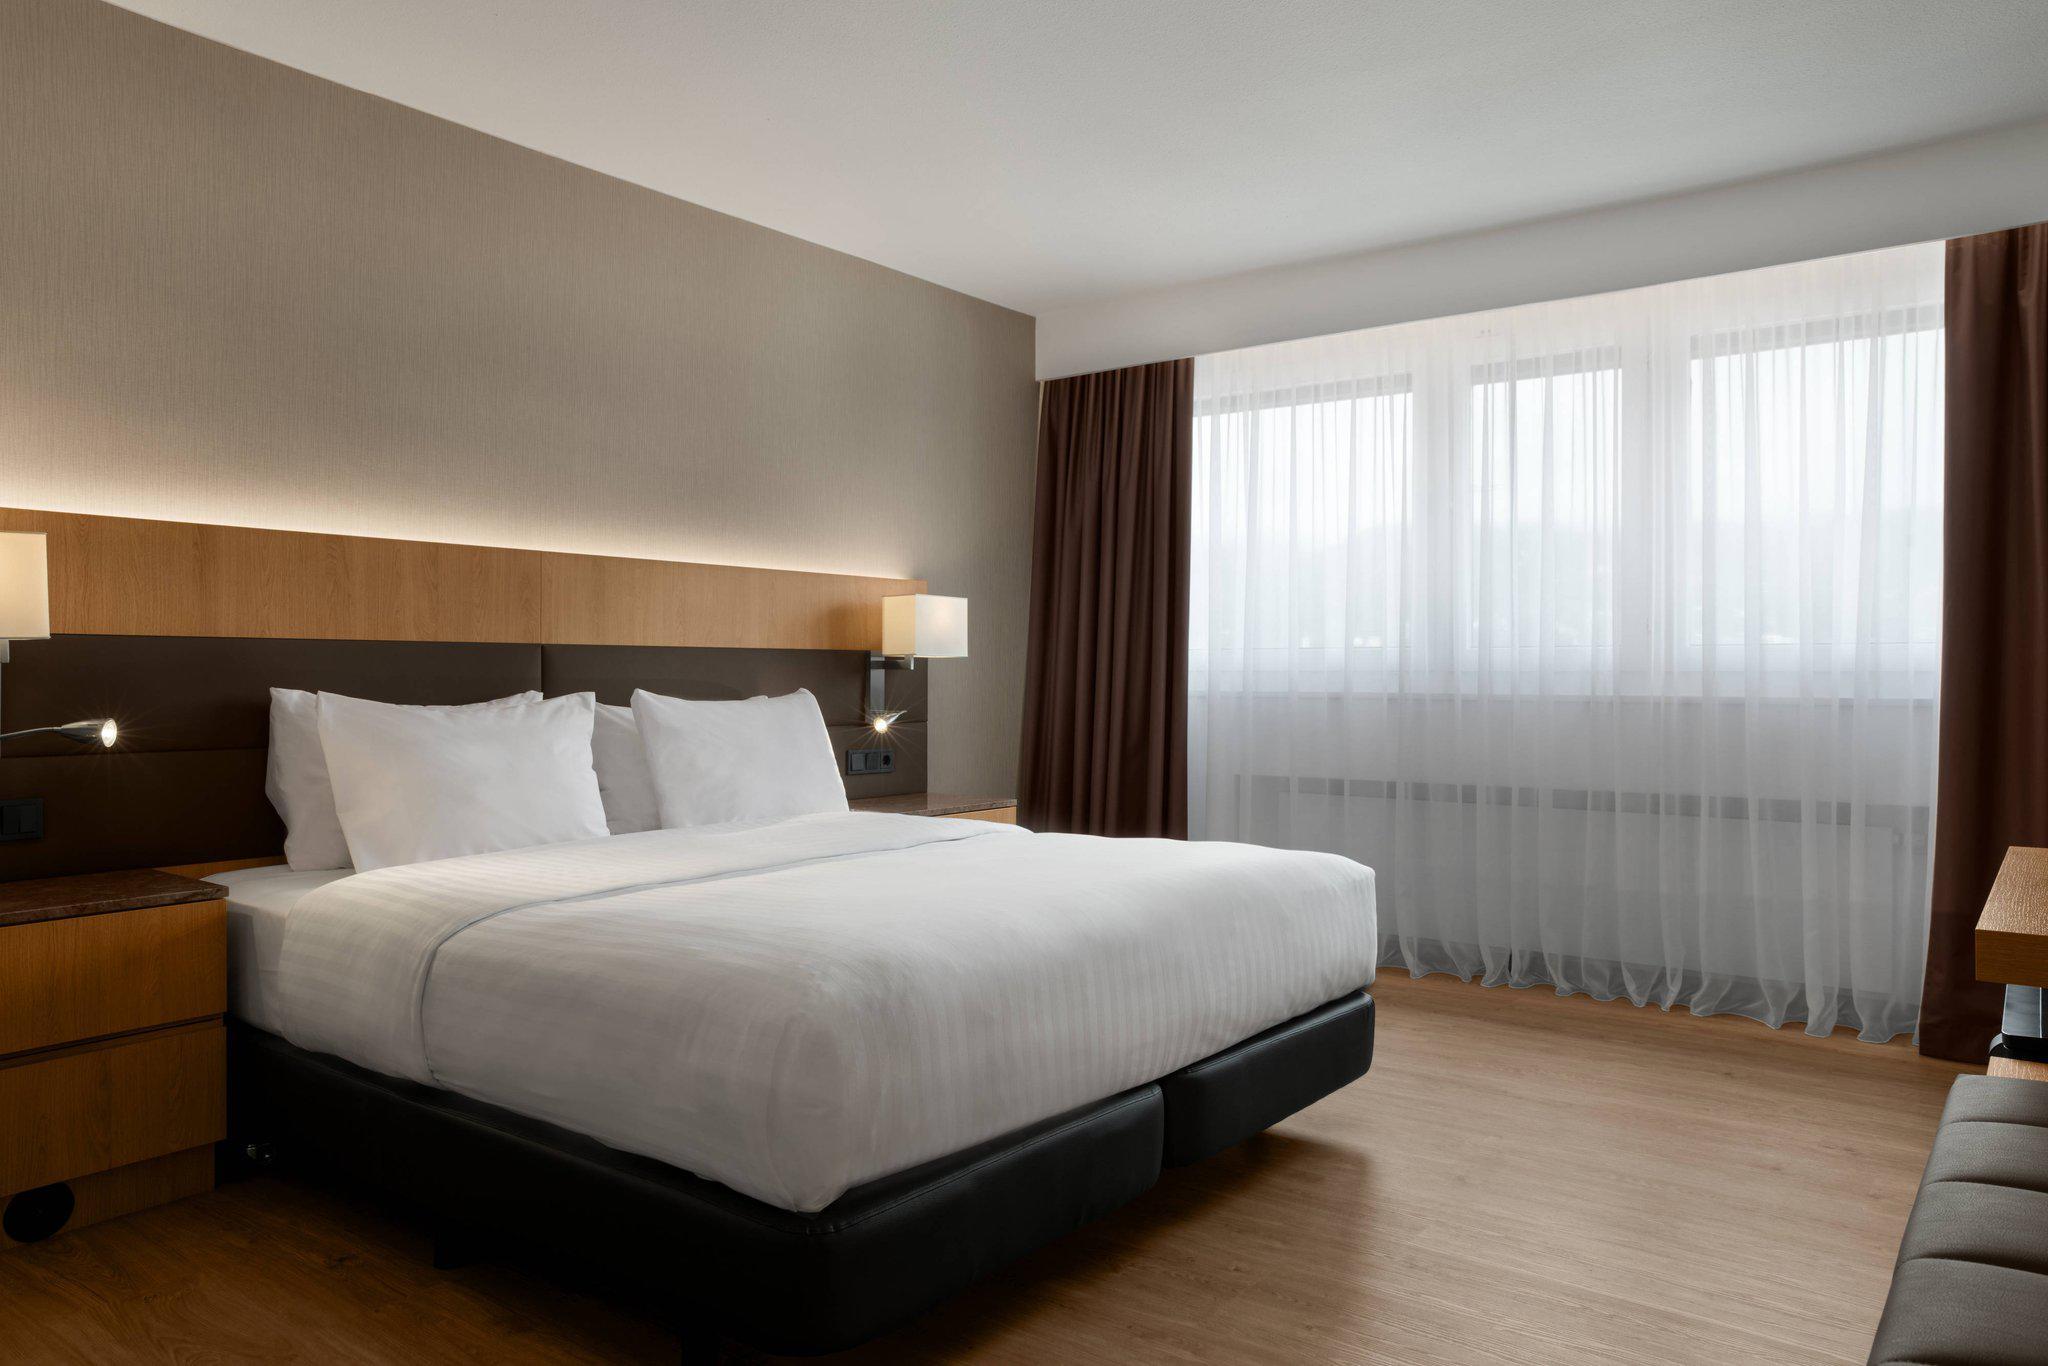 AC Hotel by Marriott Innsbruck